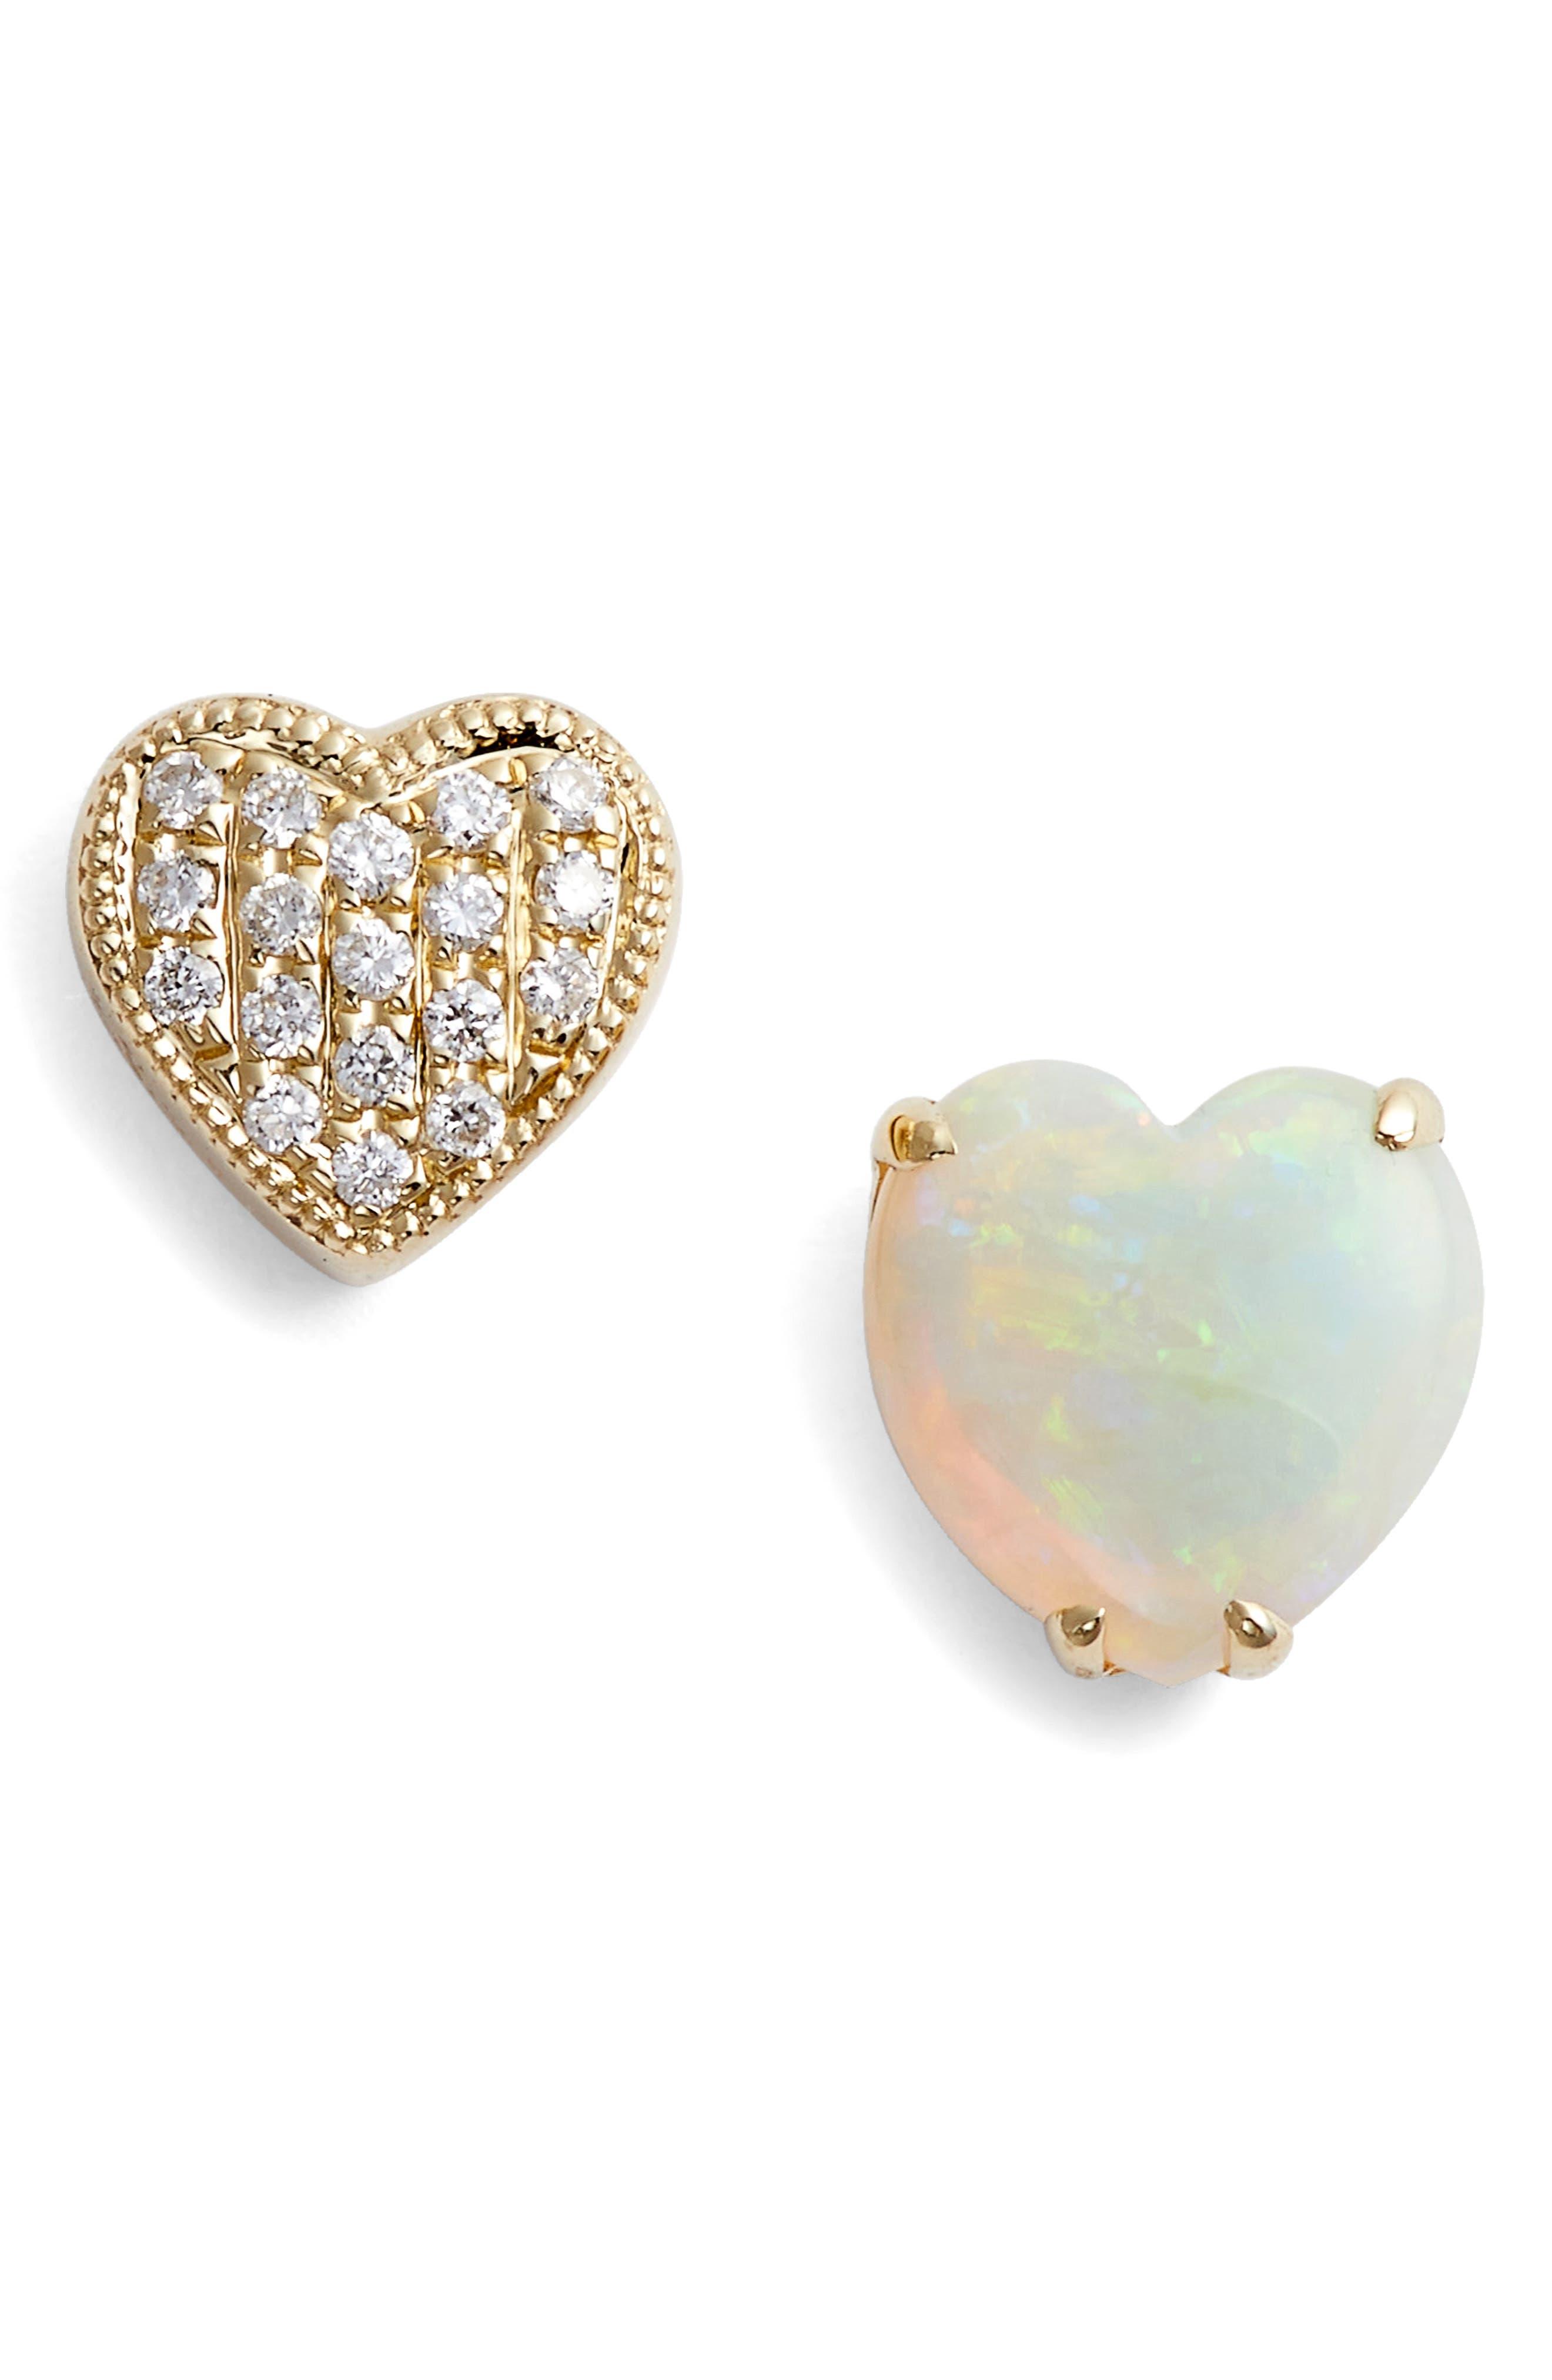 Diamond & Semiprecious Stone Stud Earrings,                             Main thumbnail 1, color,                             710